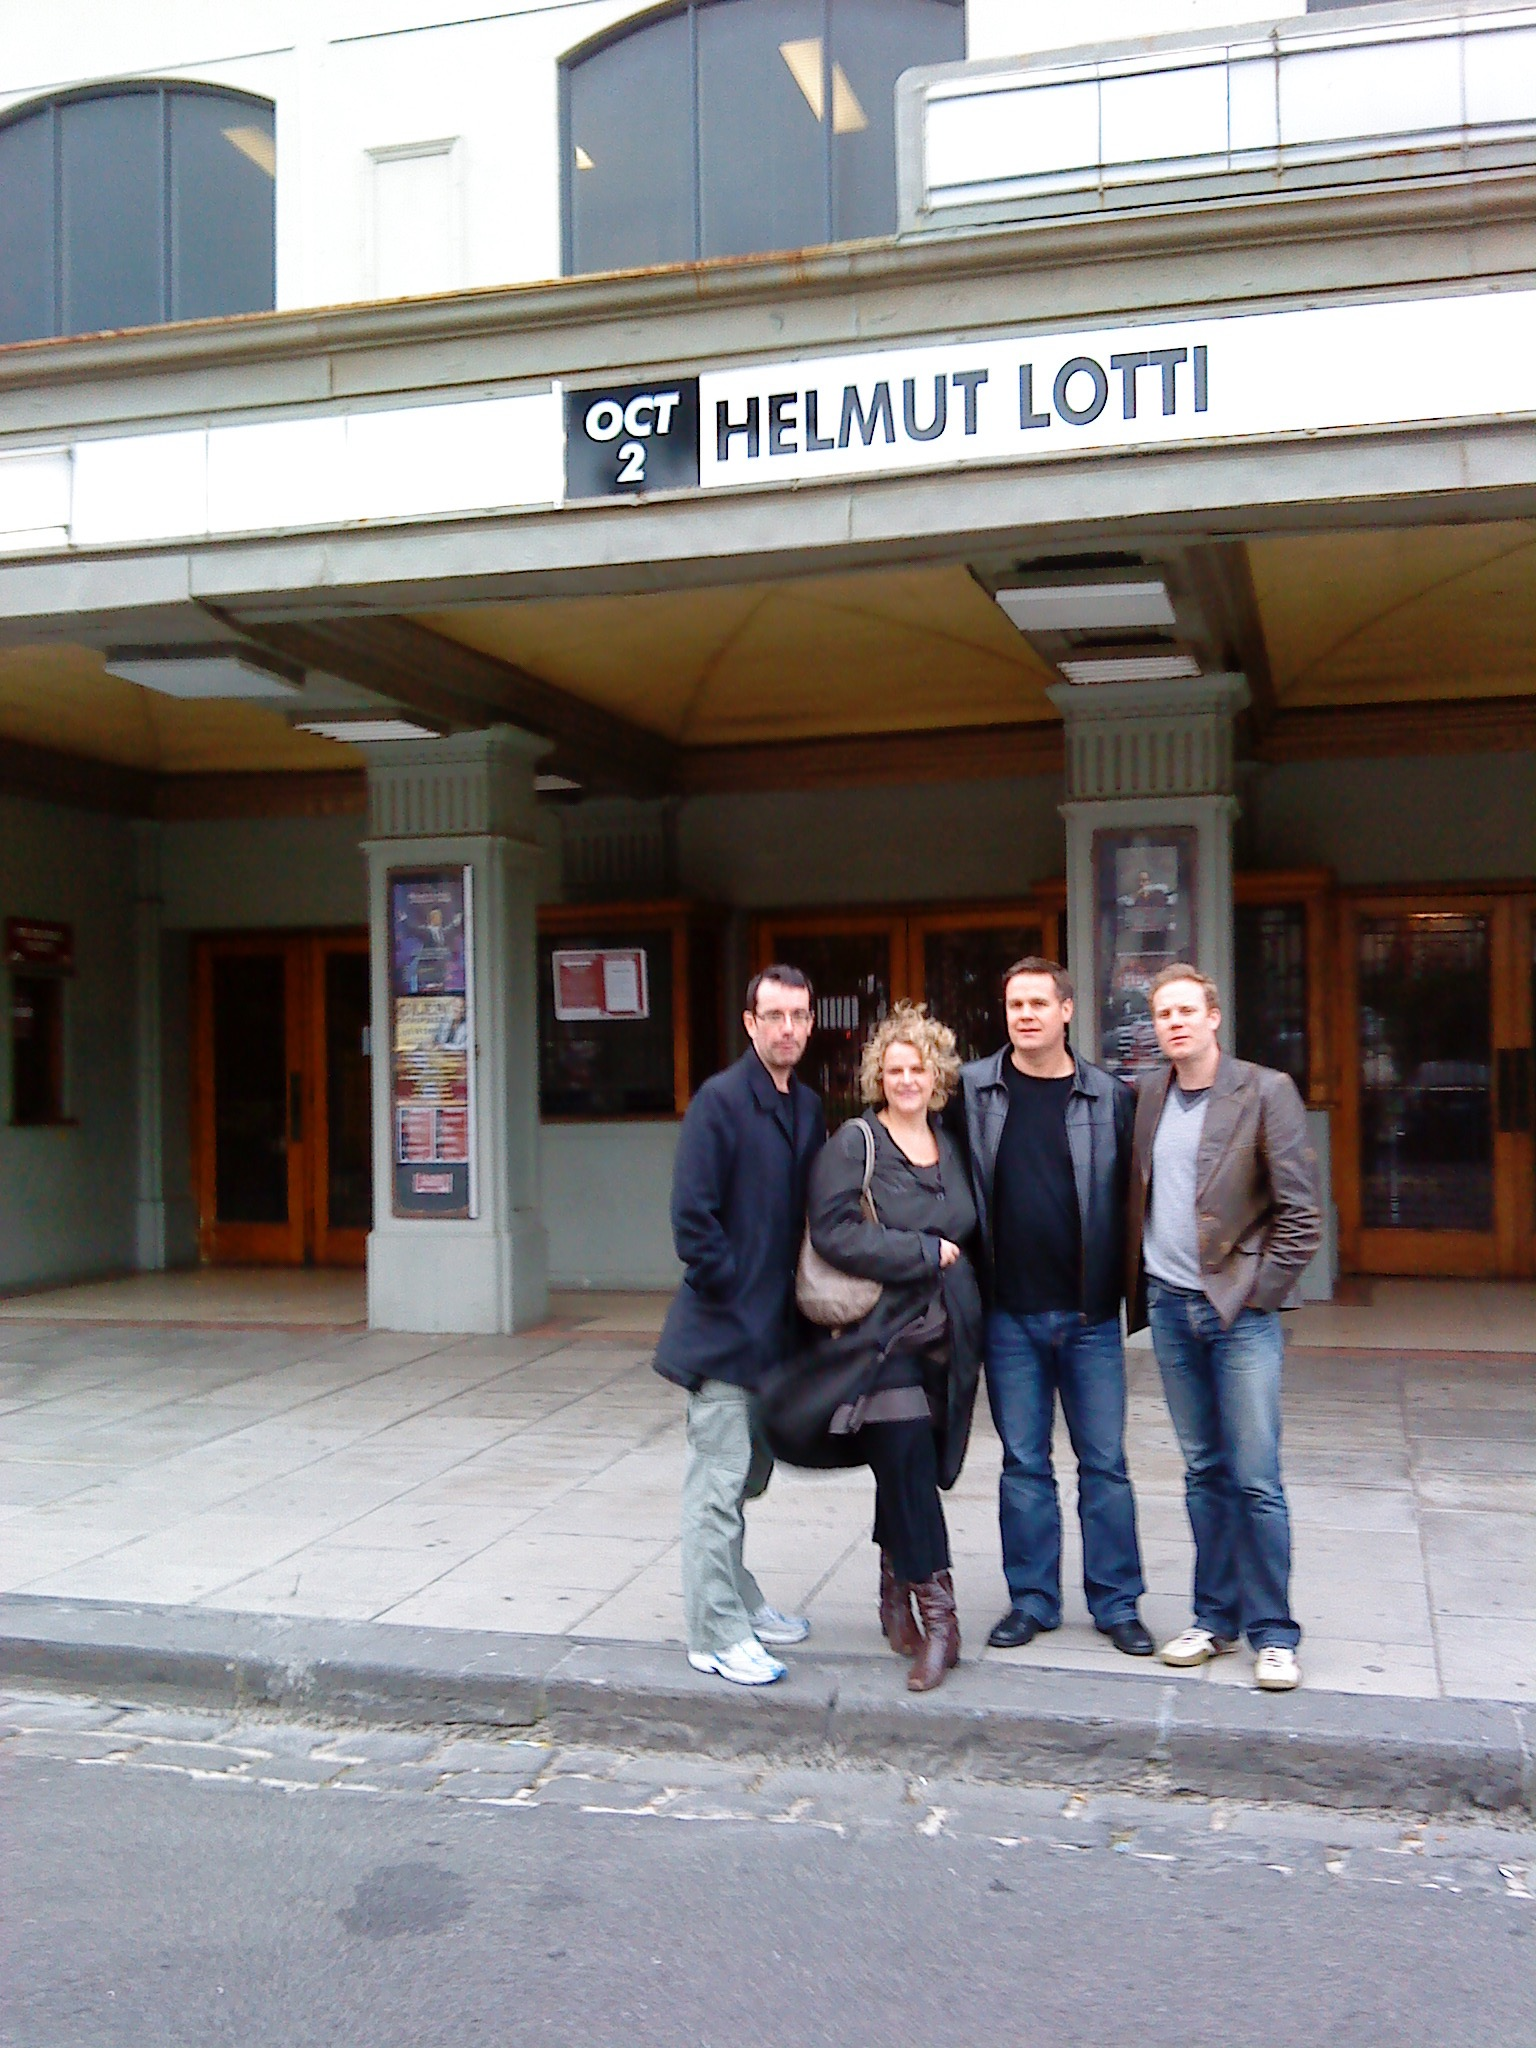 Helmut Lotti tour, Palais St Kilda